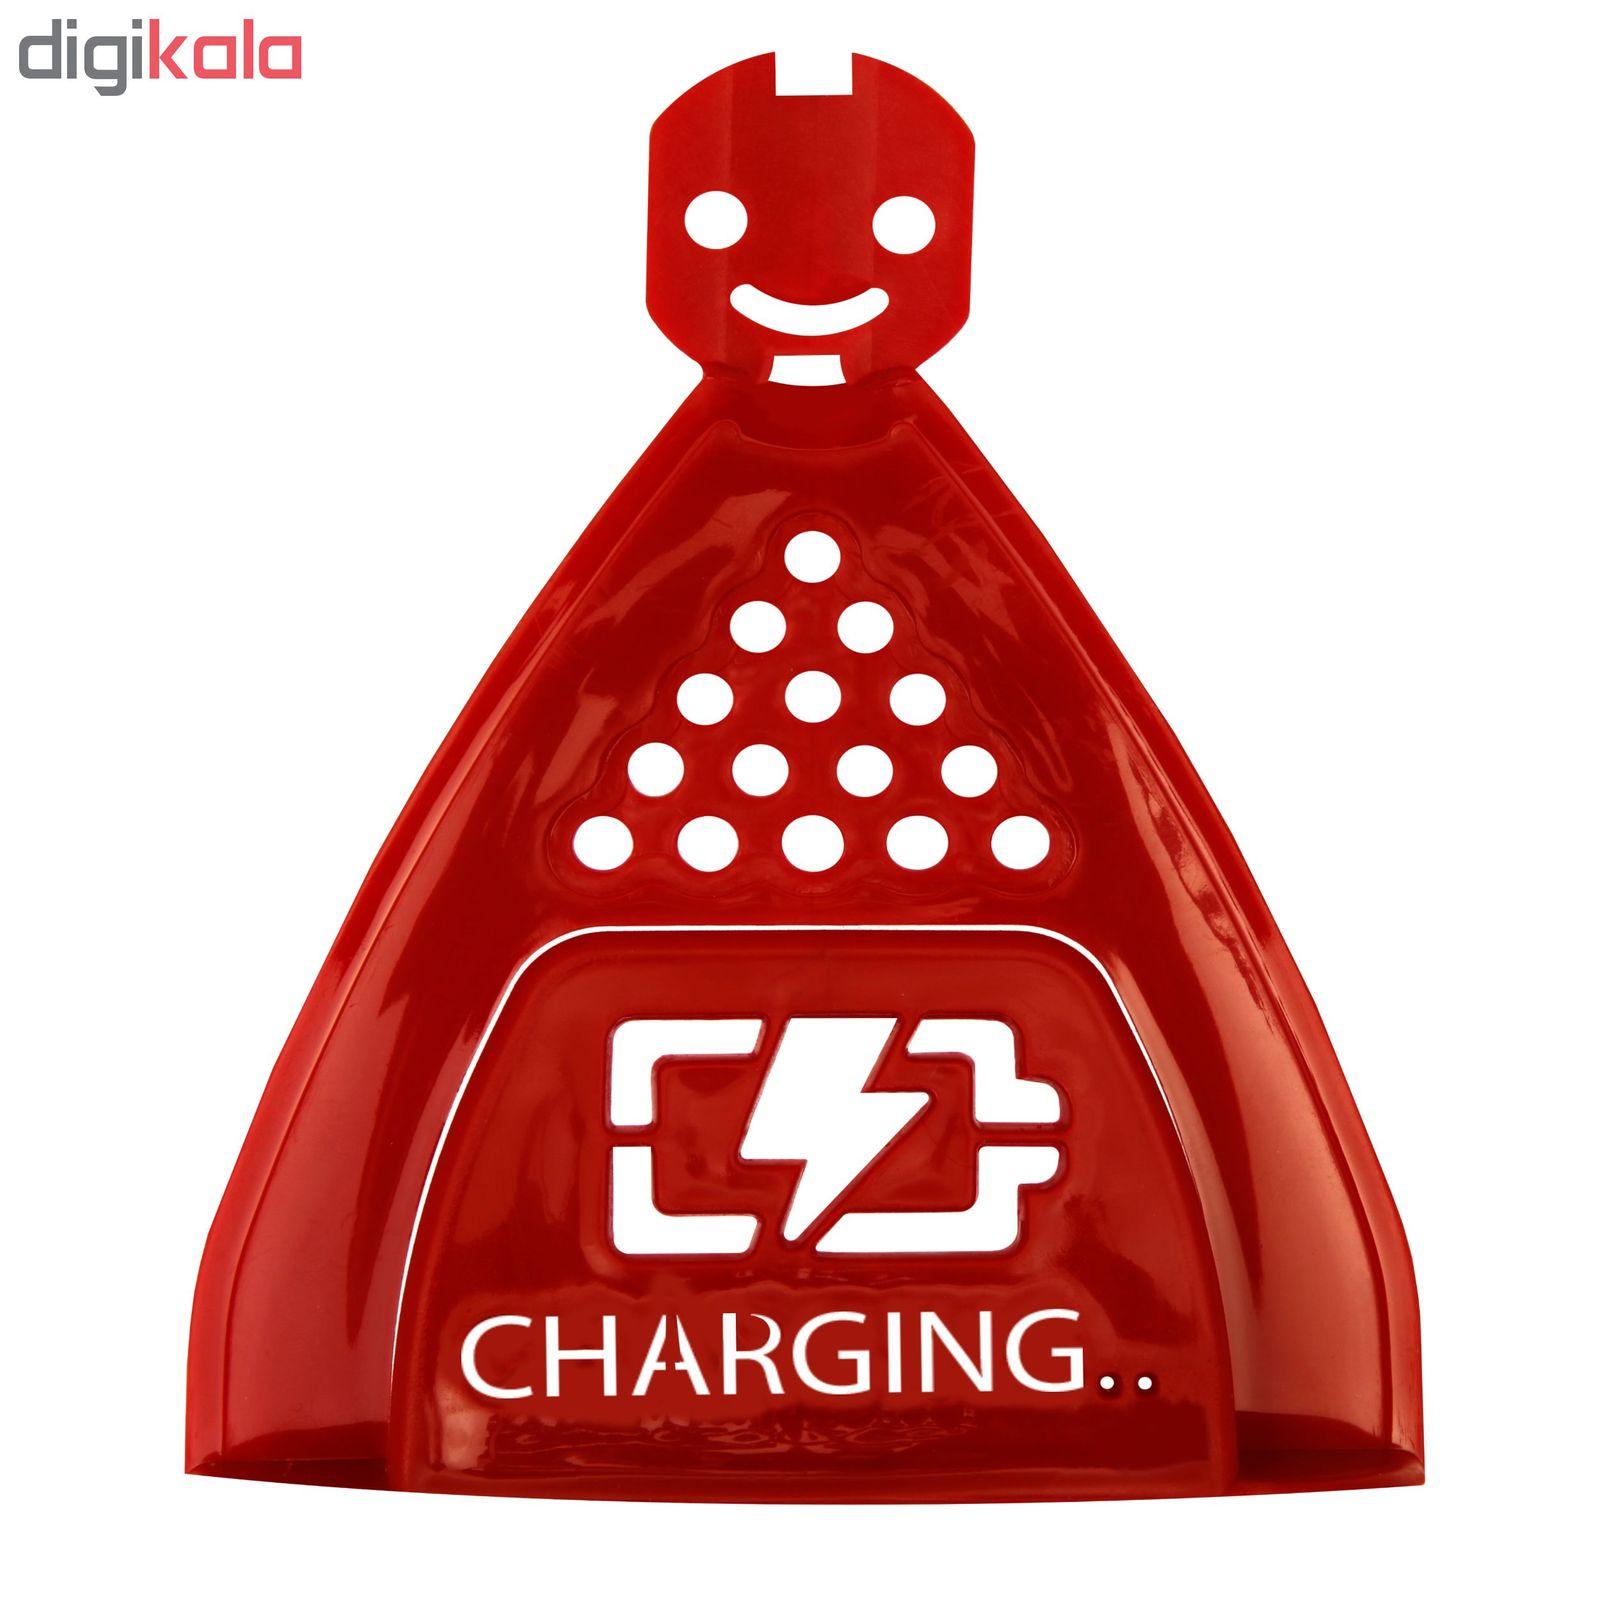 پایه نگهدارنده شارژر موبایل مدل Hng 0229 main 1 11